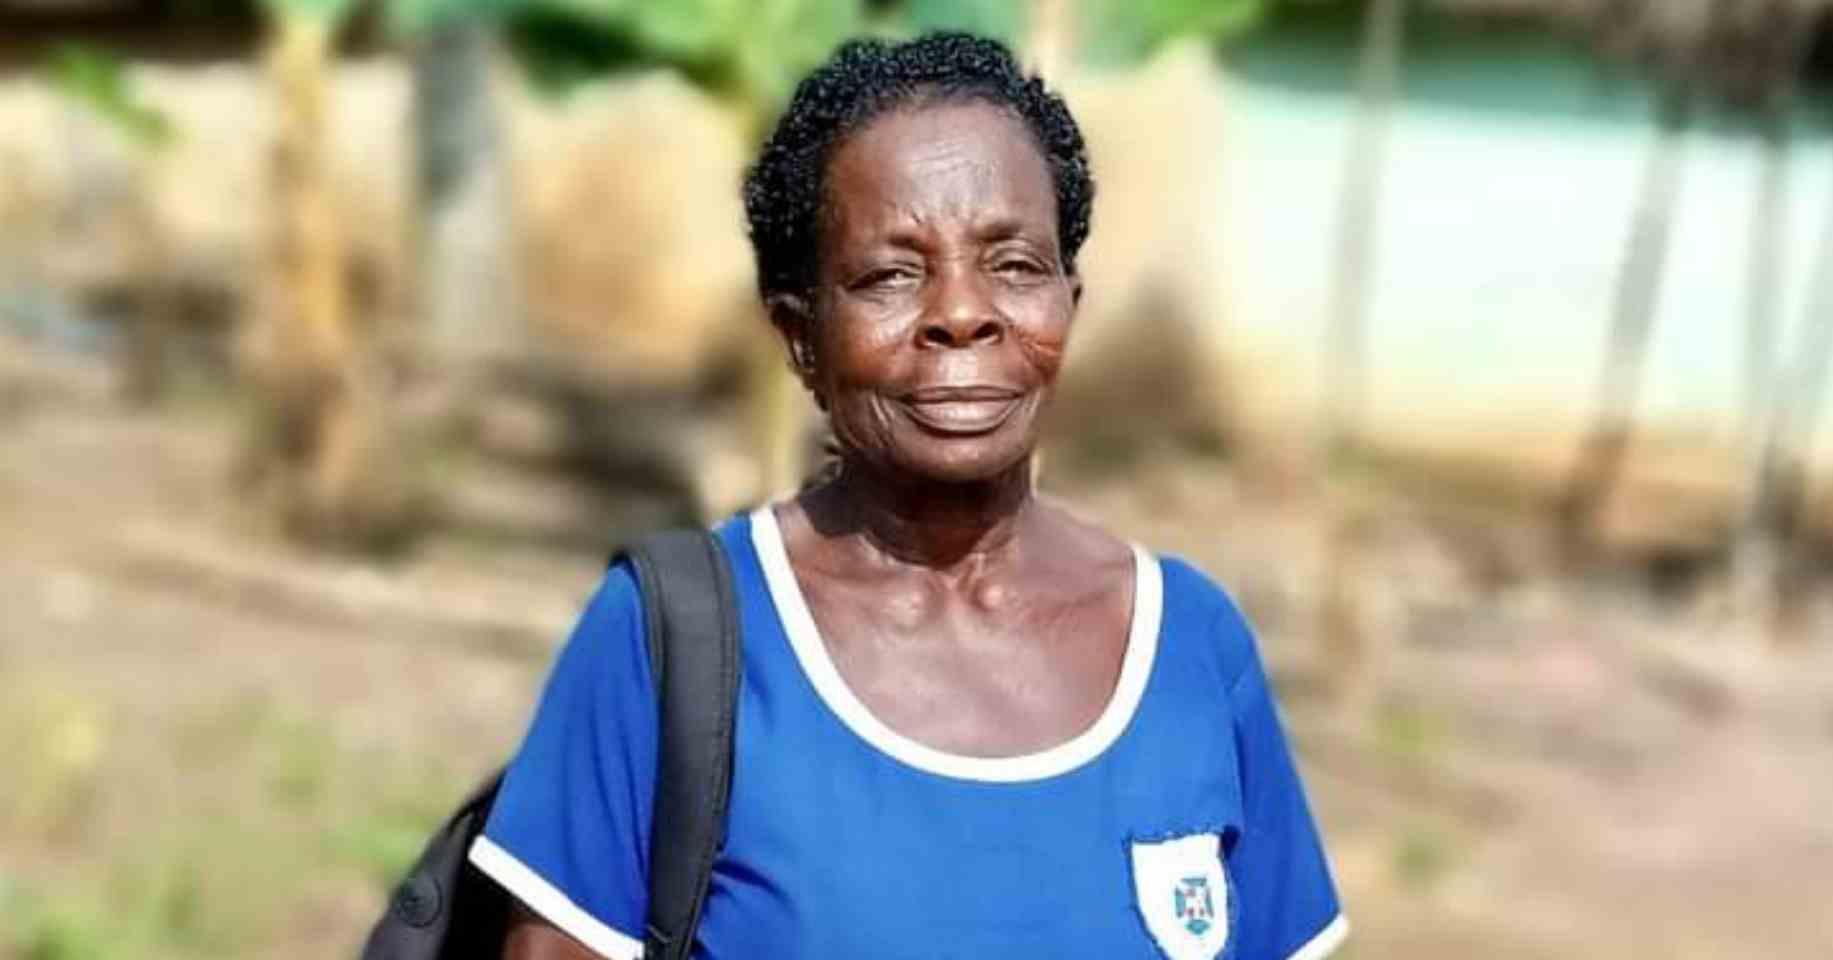 PHOTO: Meet Madam Elizabeth Yamoah, the oldest 2020 BECE candidate